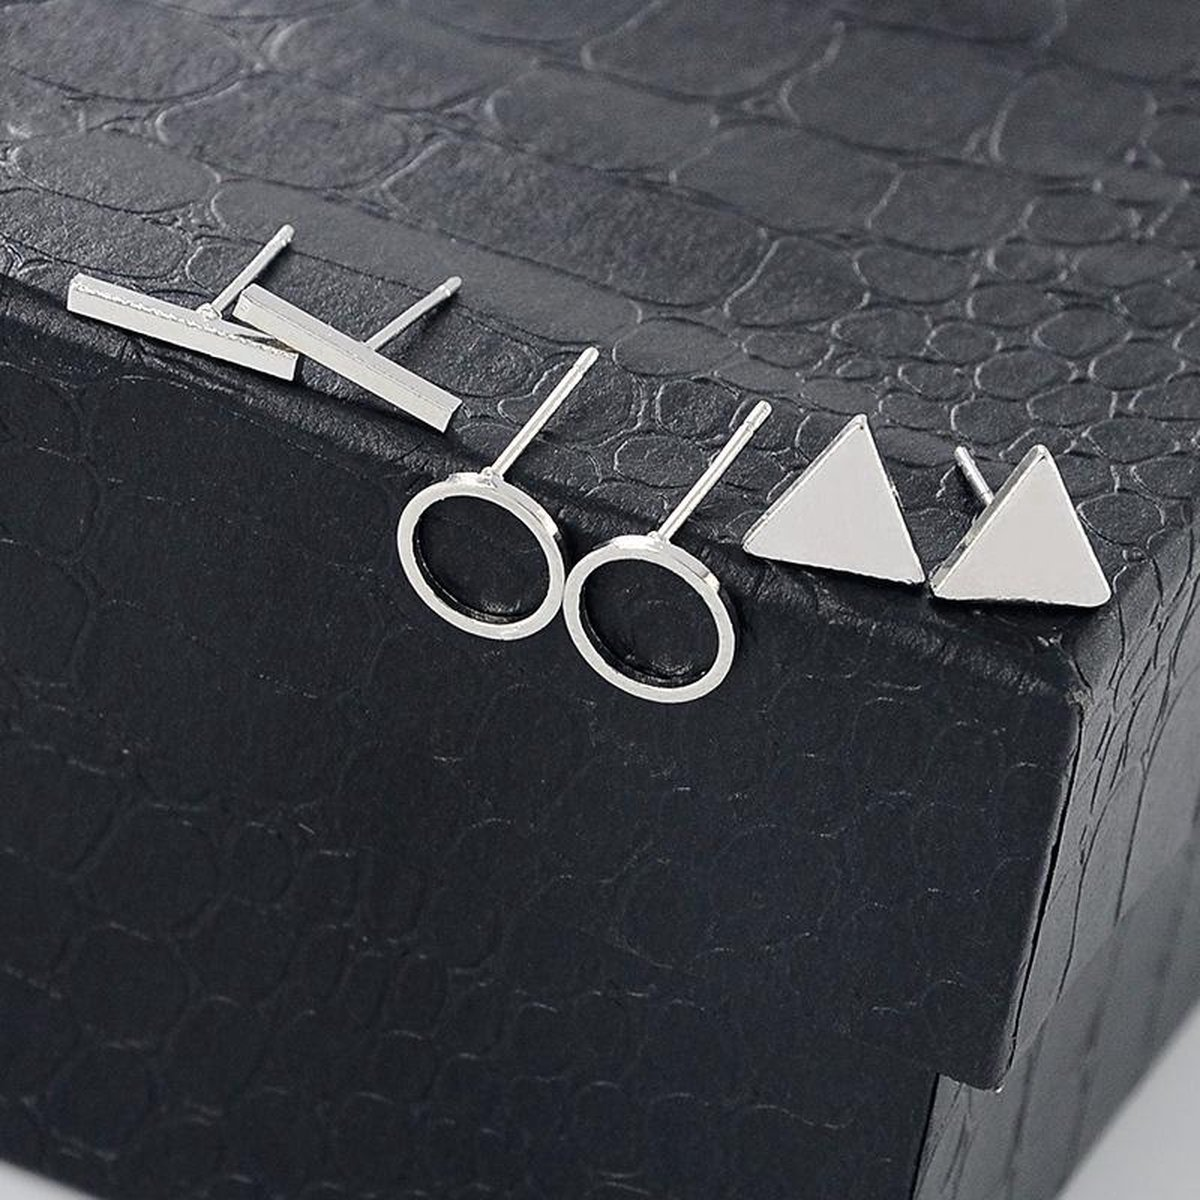 Studs 3 stuks Zilver - Bar studs - Circle studs - Triangle studs - Oorknoppen - Earcandy - Merkloos